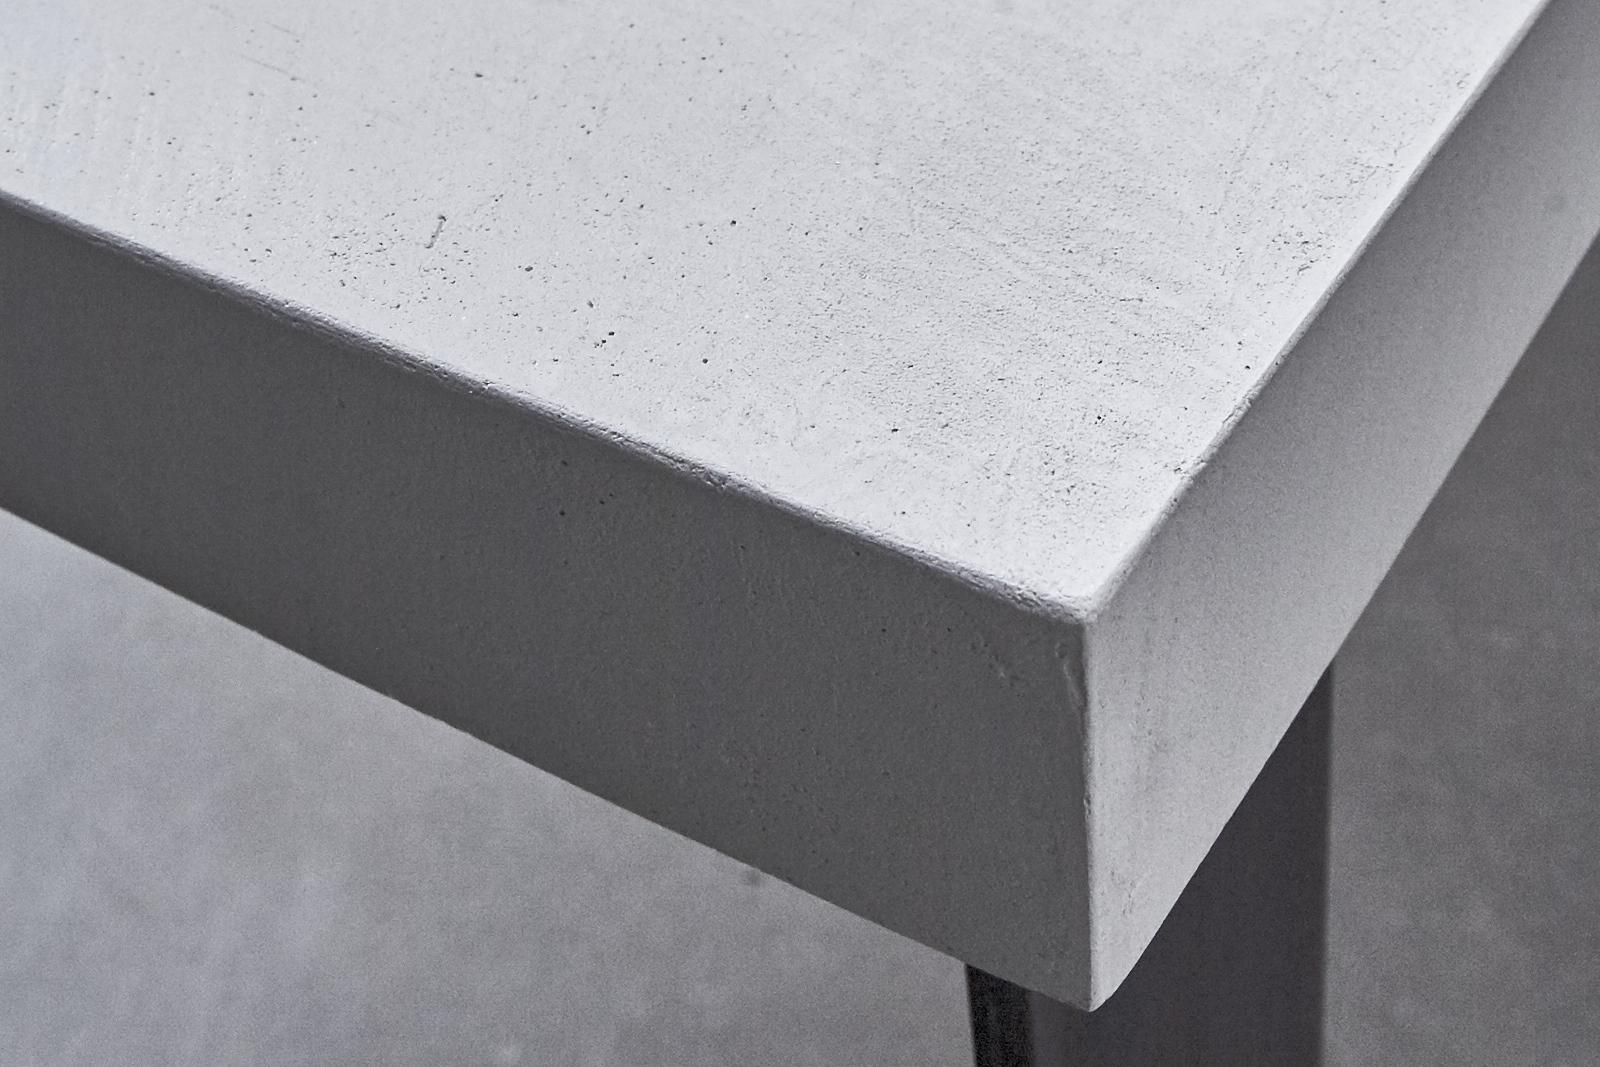 Betonlook tafel maken betonnen keukenblad maken for Tafelblad maken